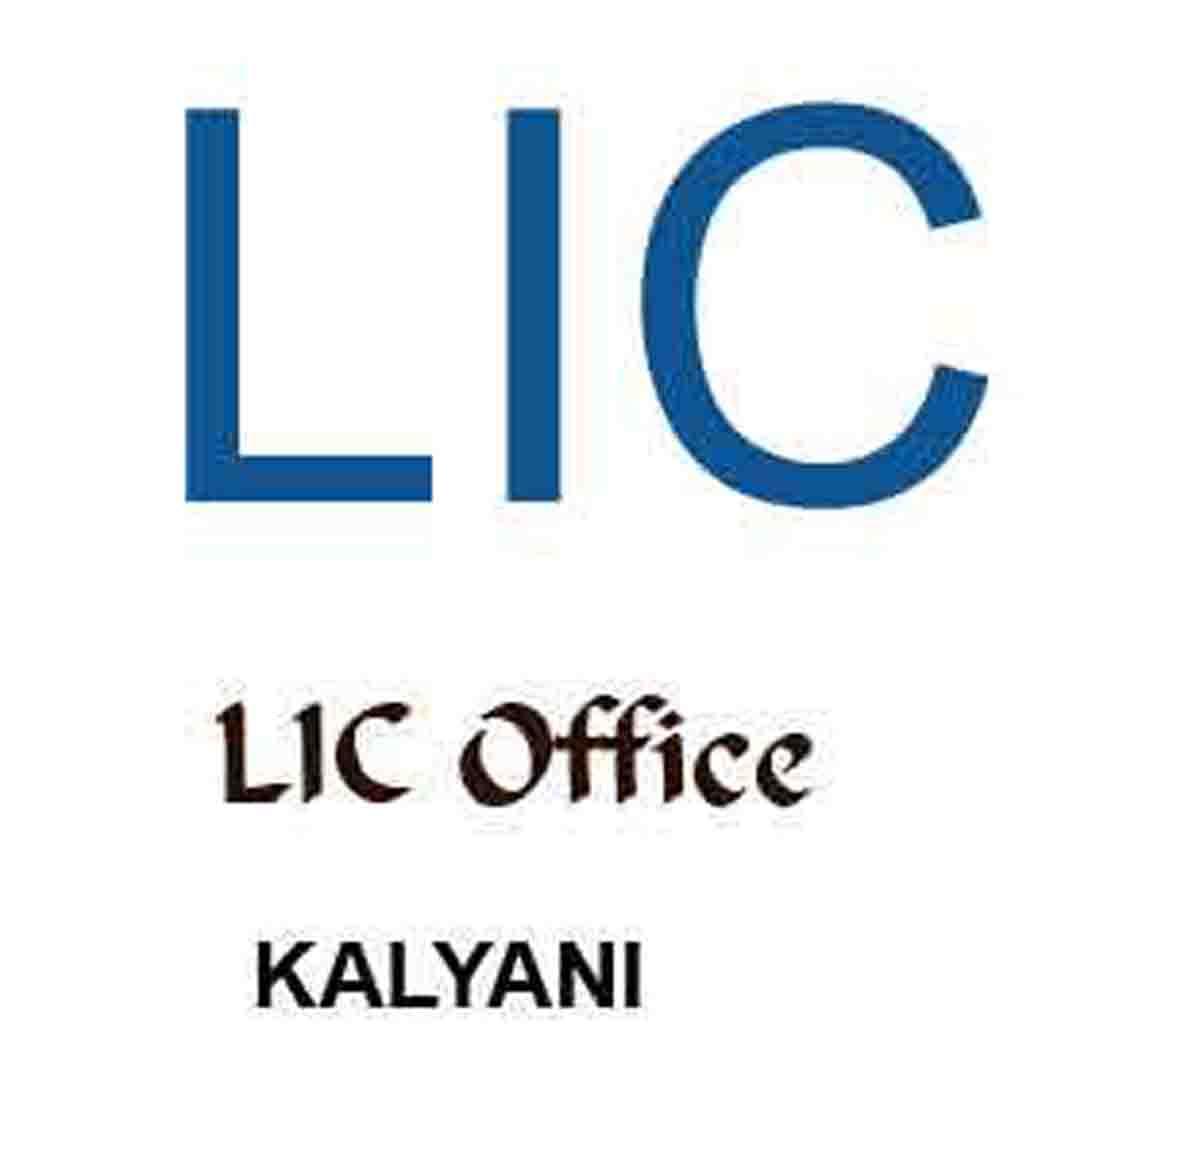 lic office kalyani